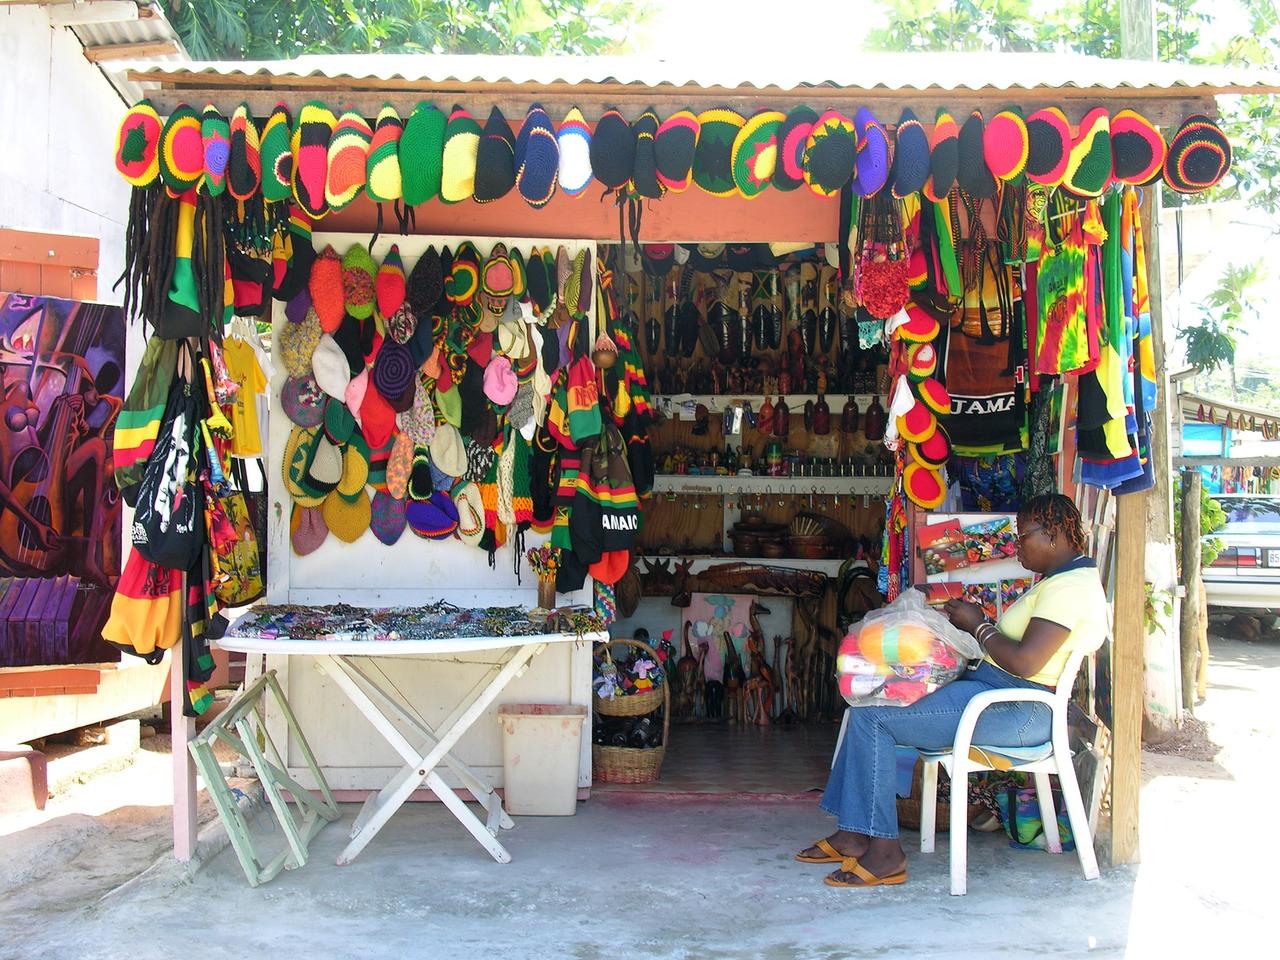 Negril craft colony 2 | the Original Green | Steve Mouzon